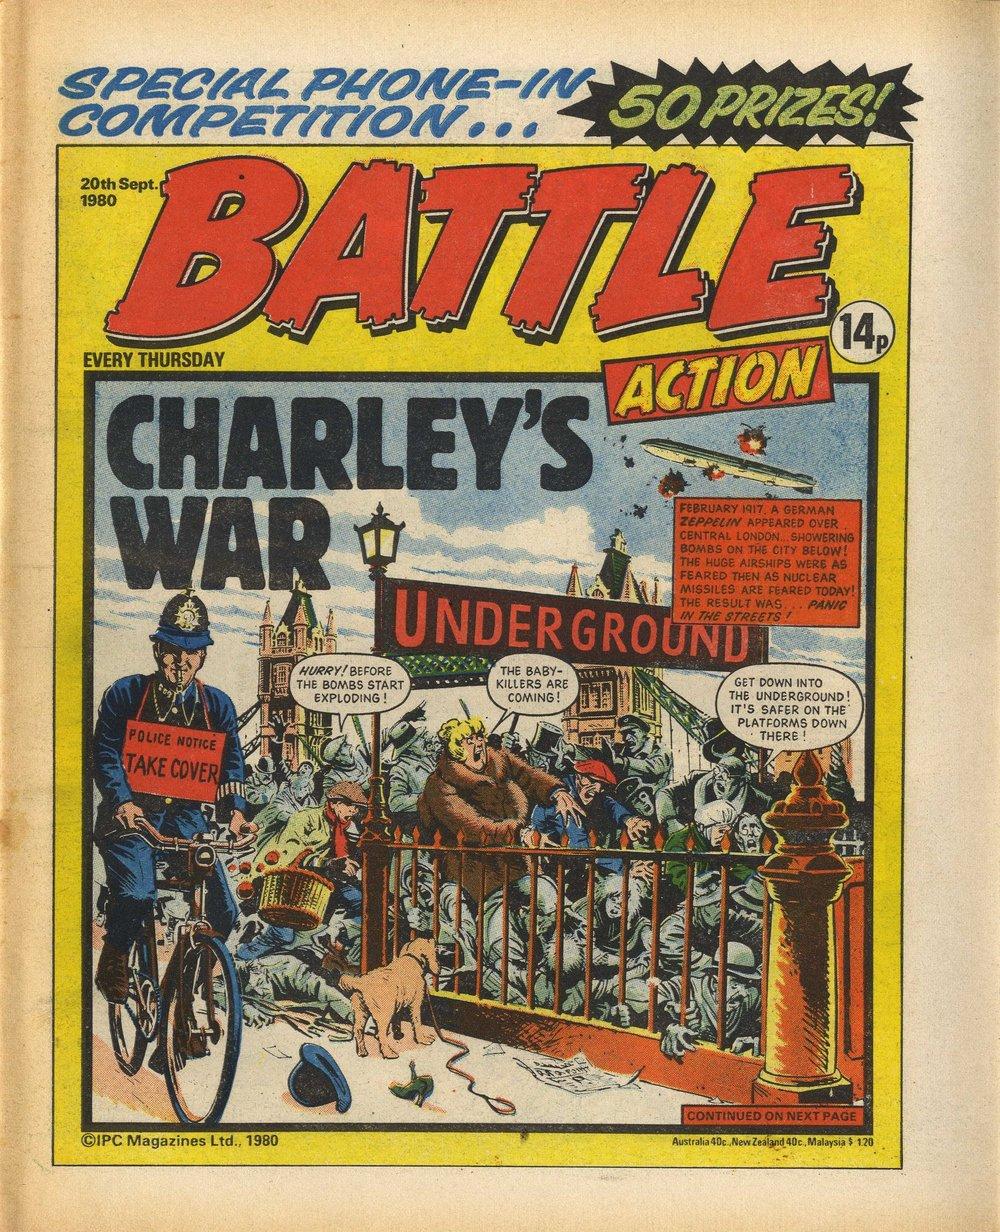 Battle 200980 001.jpg